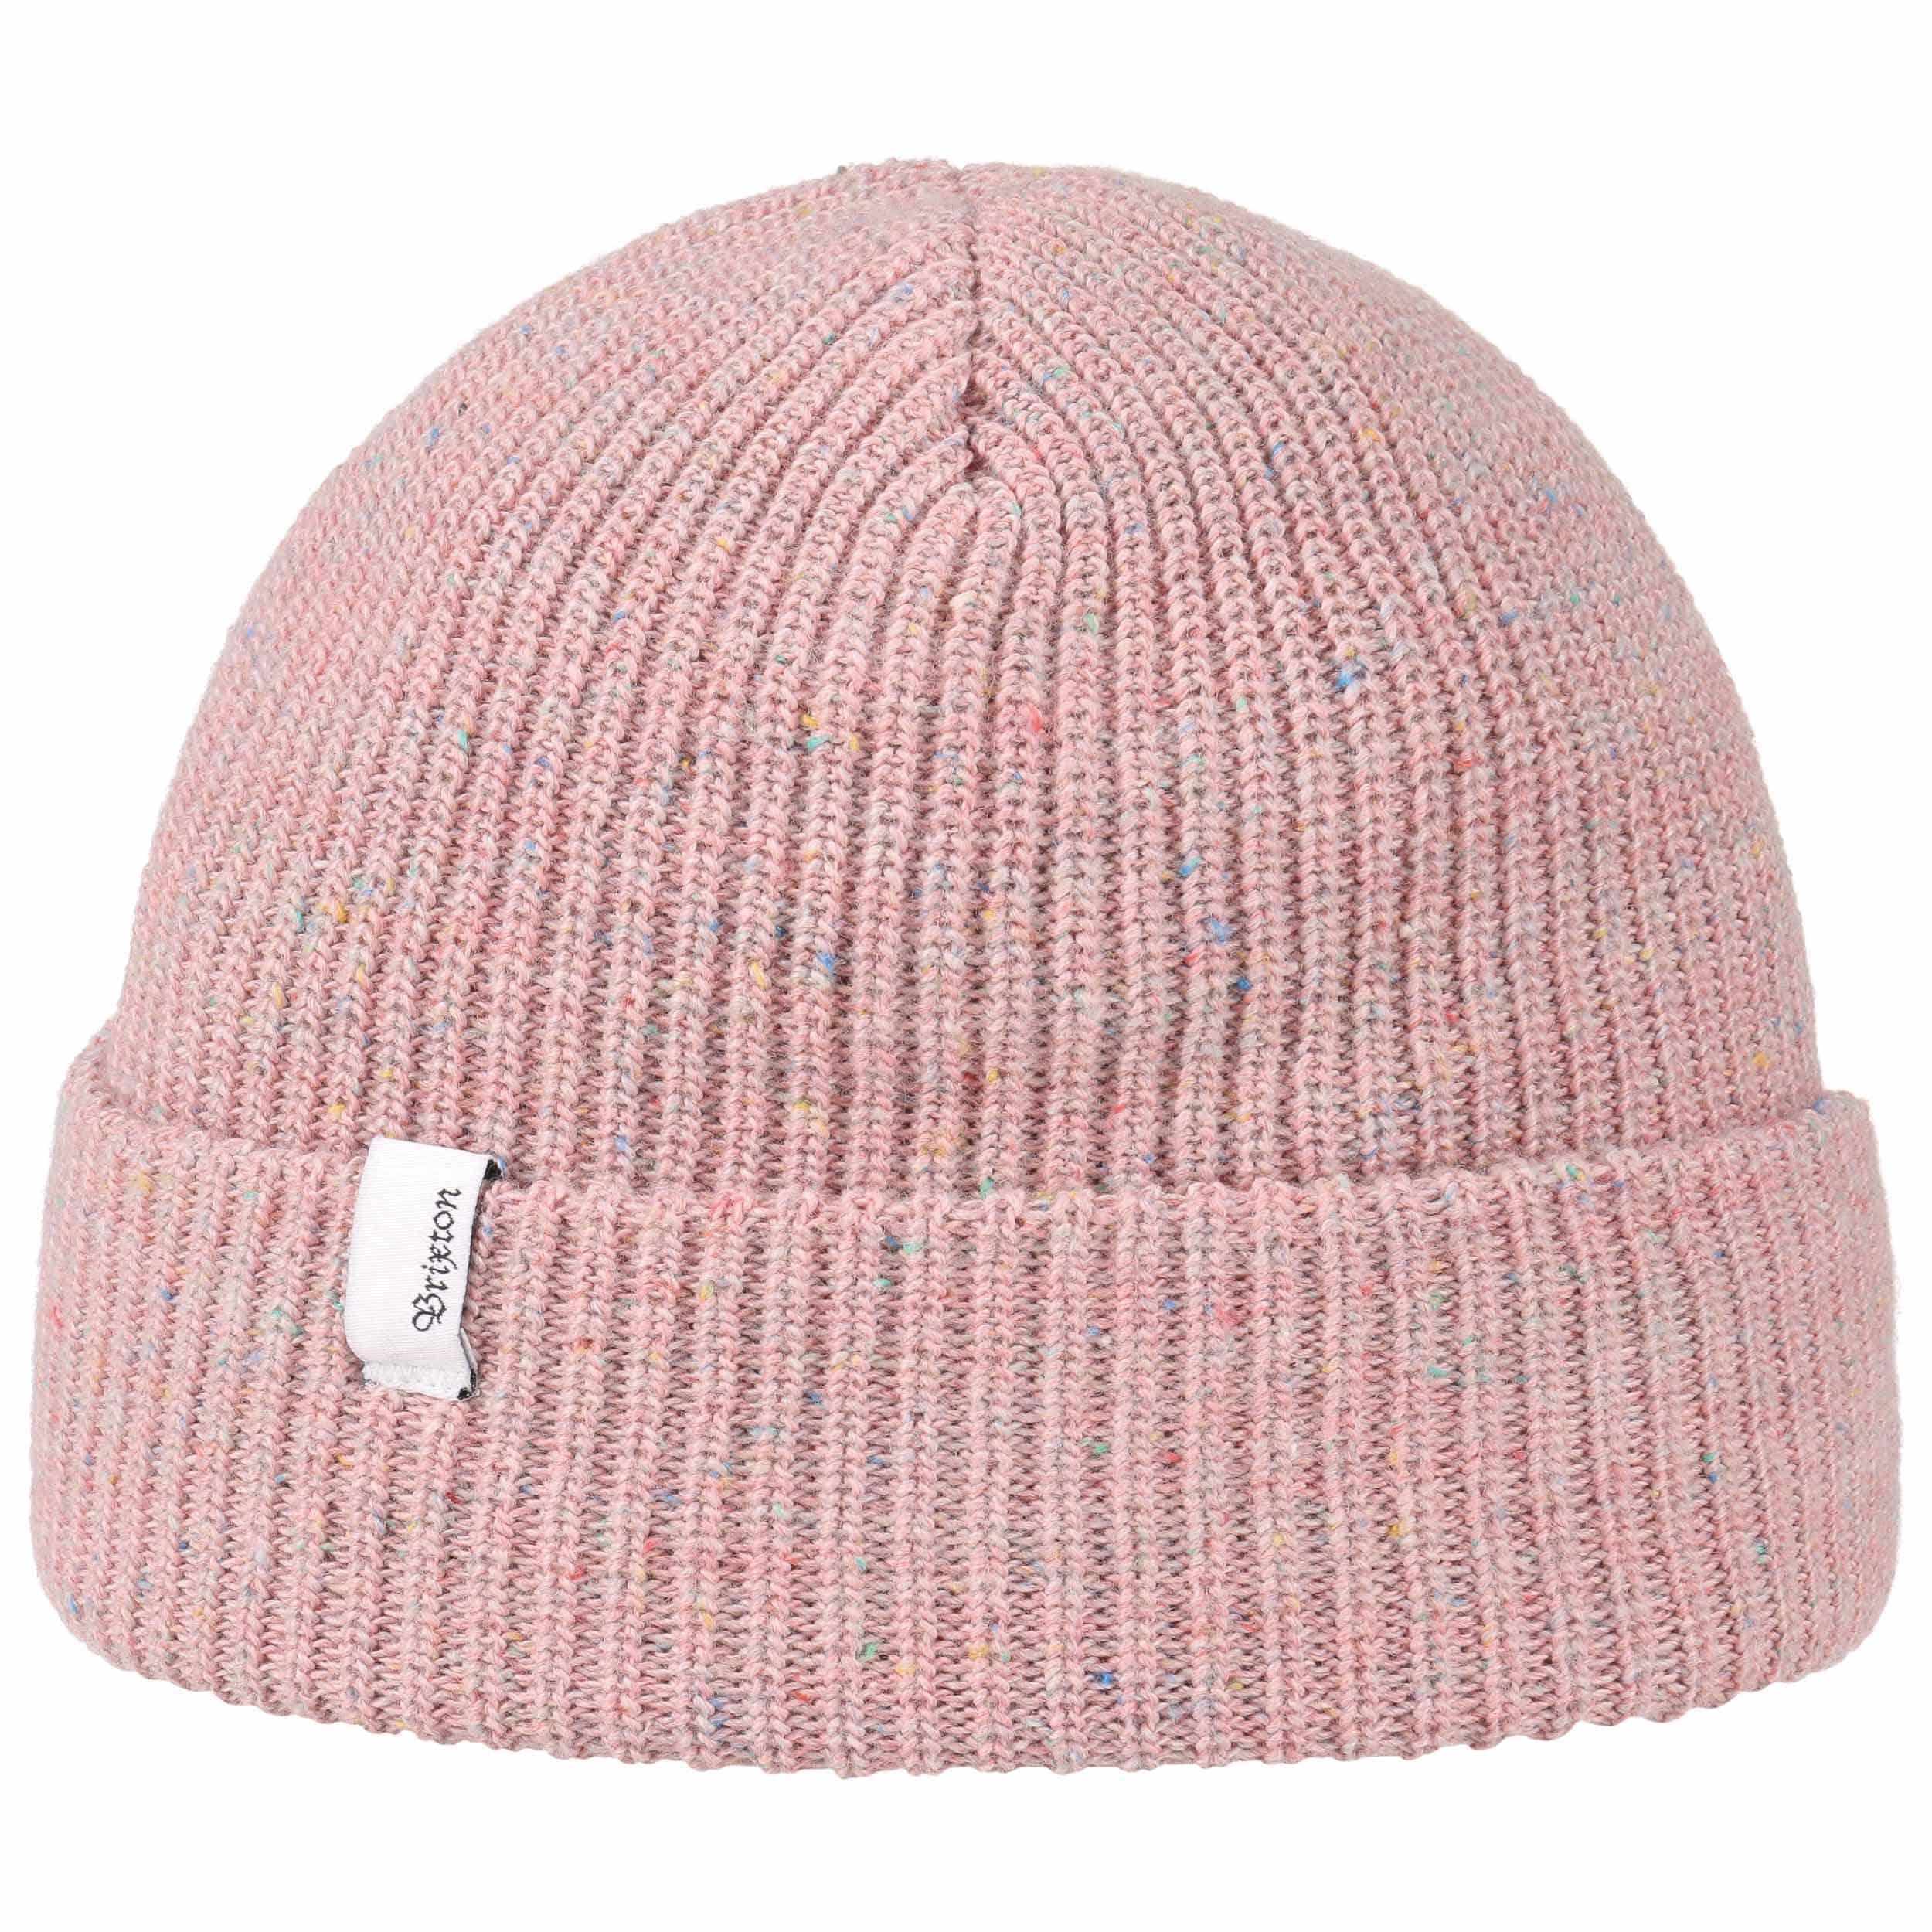 b2cec7b6 reduced aspen beanie hat by brixton rose 5 250ea ea6be